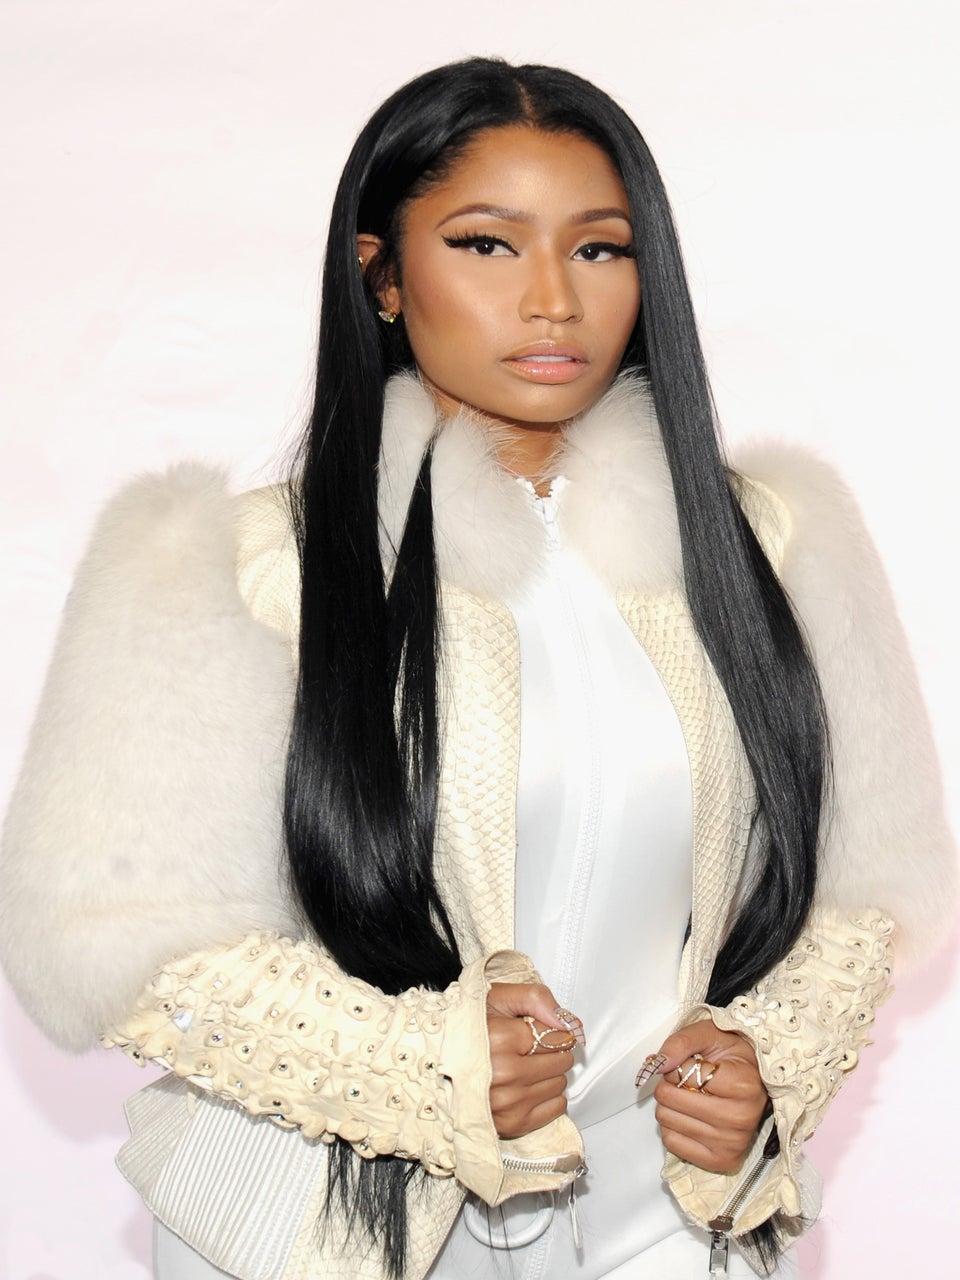 Nicki Minaj's Los Angeles Mansion Was Burglarized